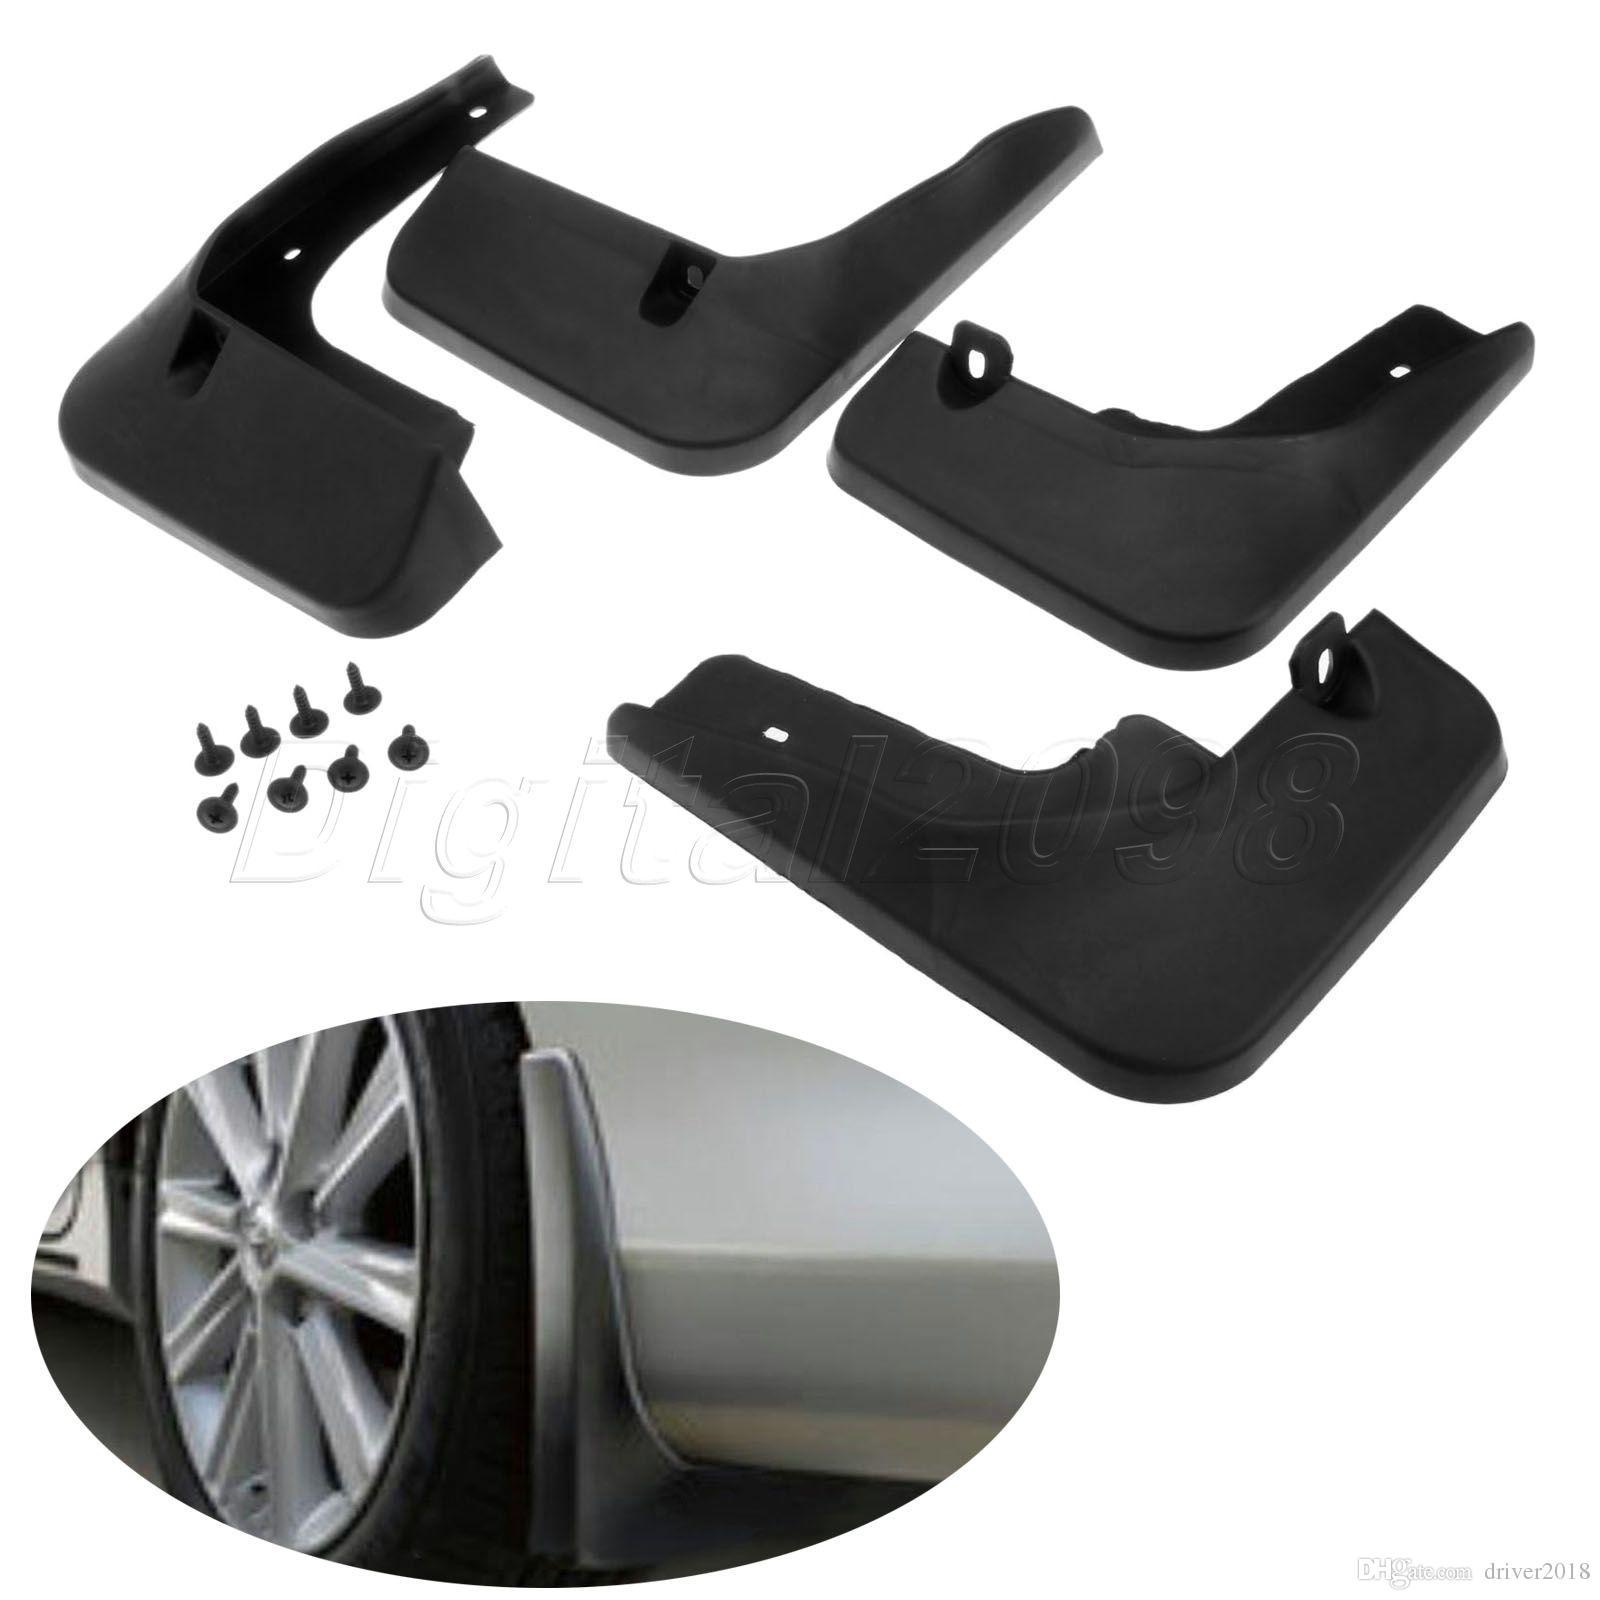 Splash Guard Car >> 4pcs Set Mudguard Splash Guards Fender Mud Flaps On Car For Toyota Camry 2012 2014 Auto Splasher Replace Accessories Car Styling